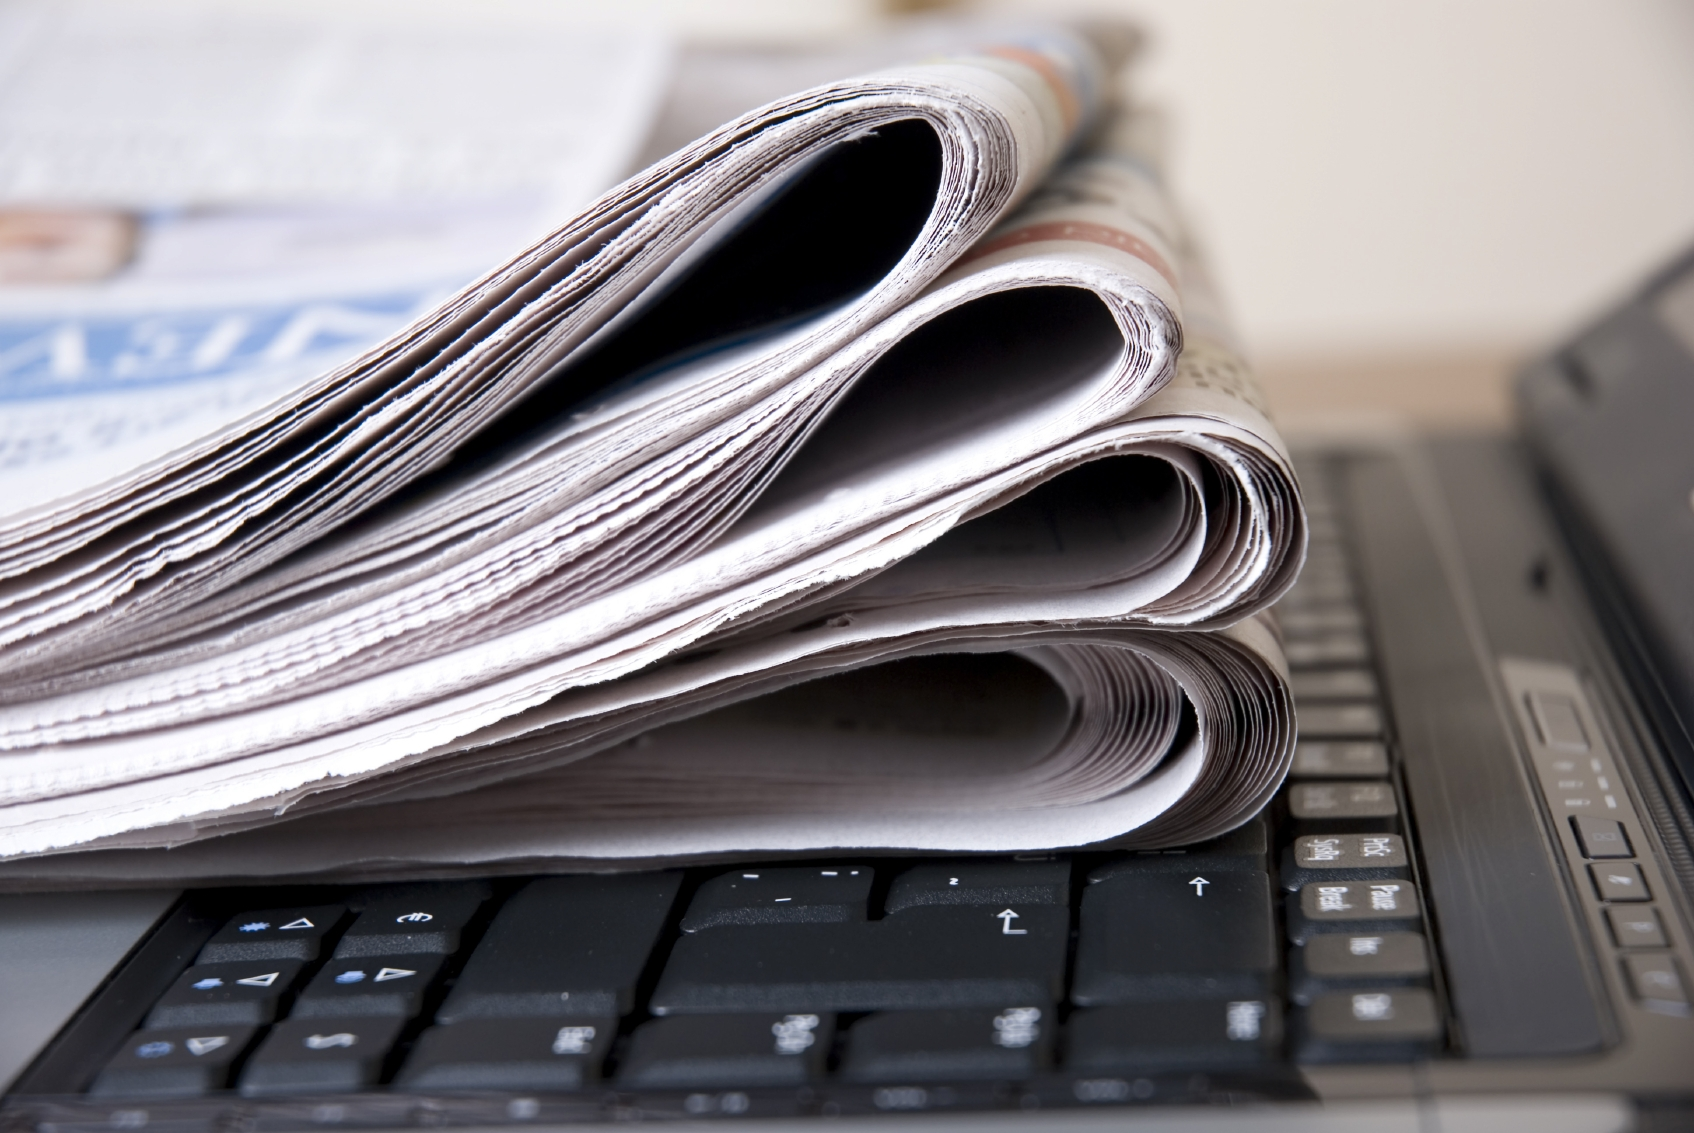 newspaper-computer